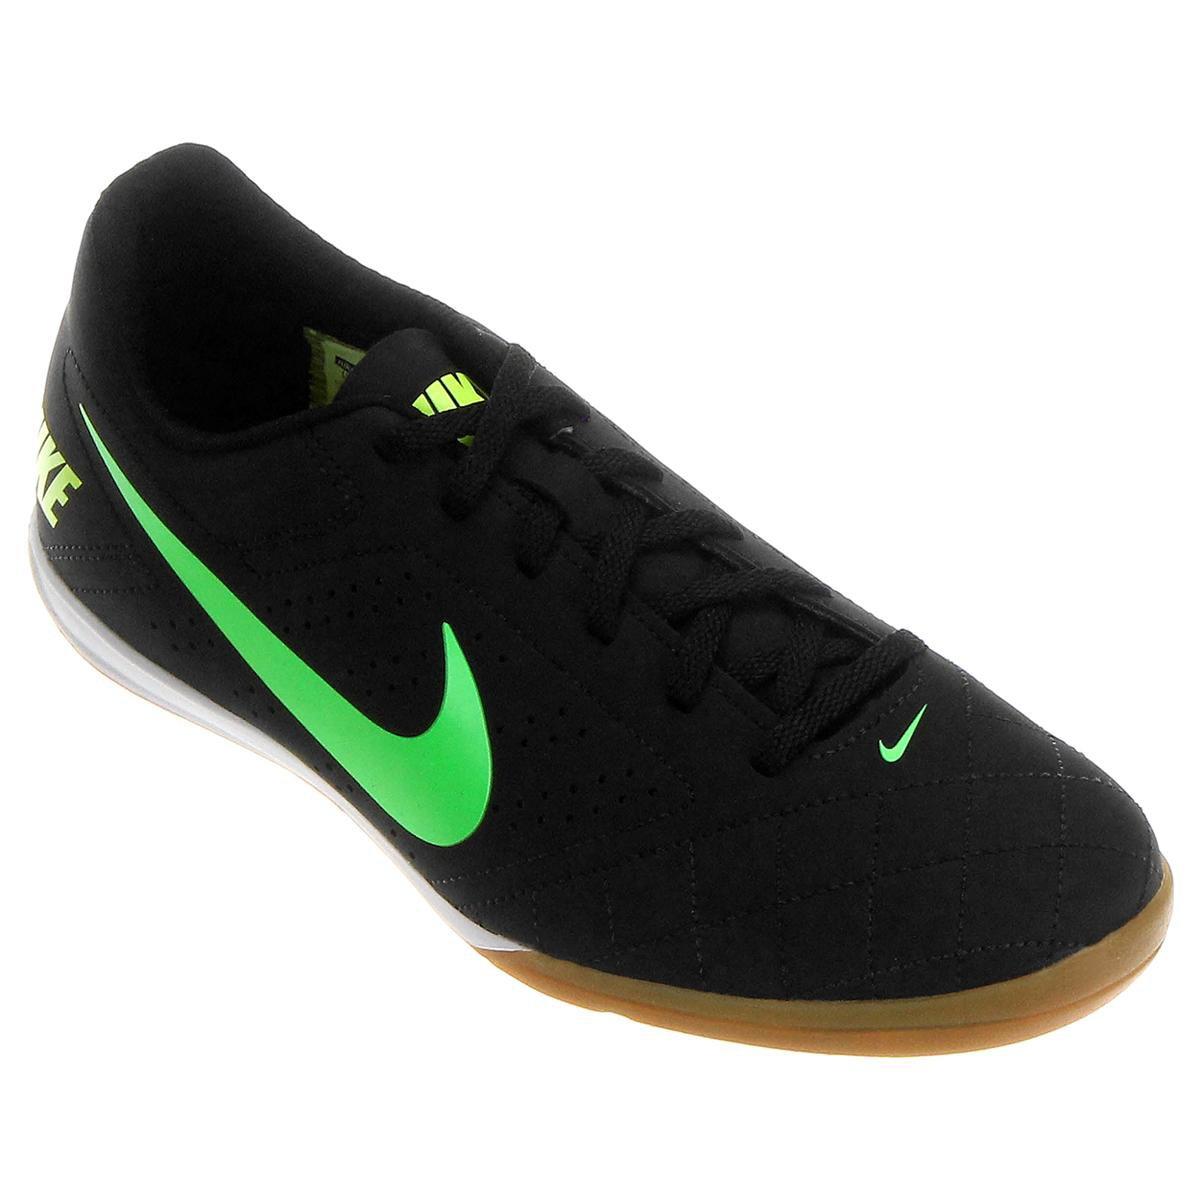 Chuteira Futsal Nike Beco 2 Masculina Preto e Verde Limão - Compre ... 9ba6c98f6d834